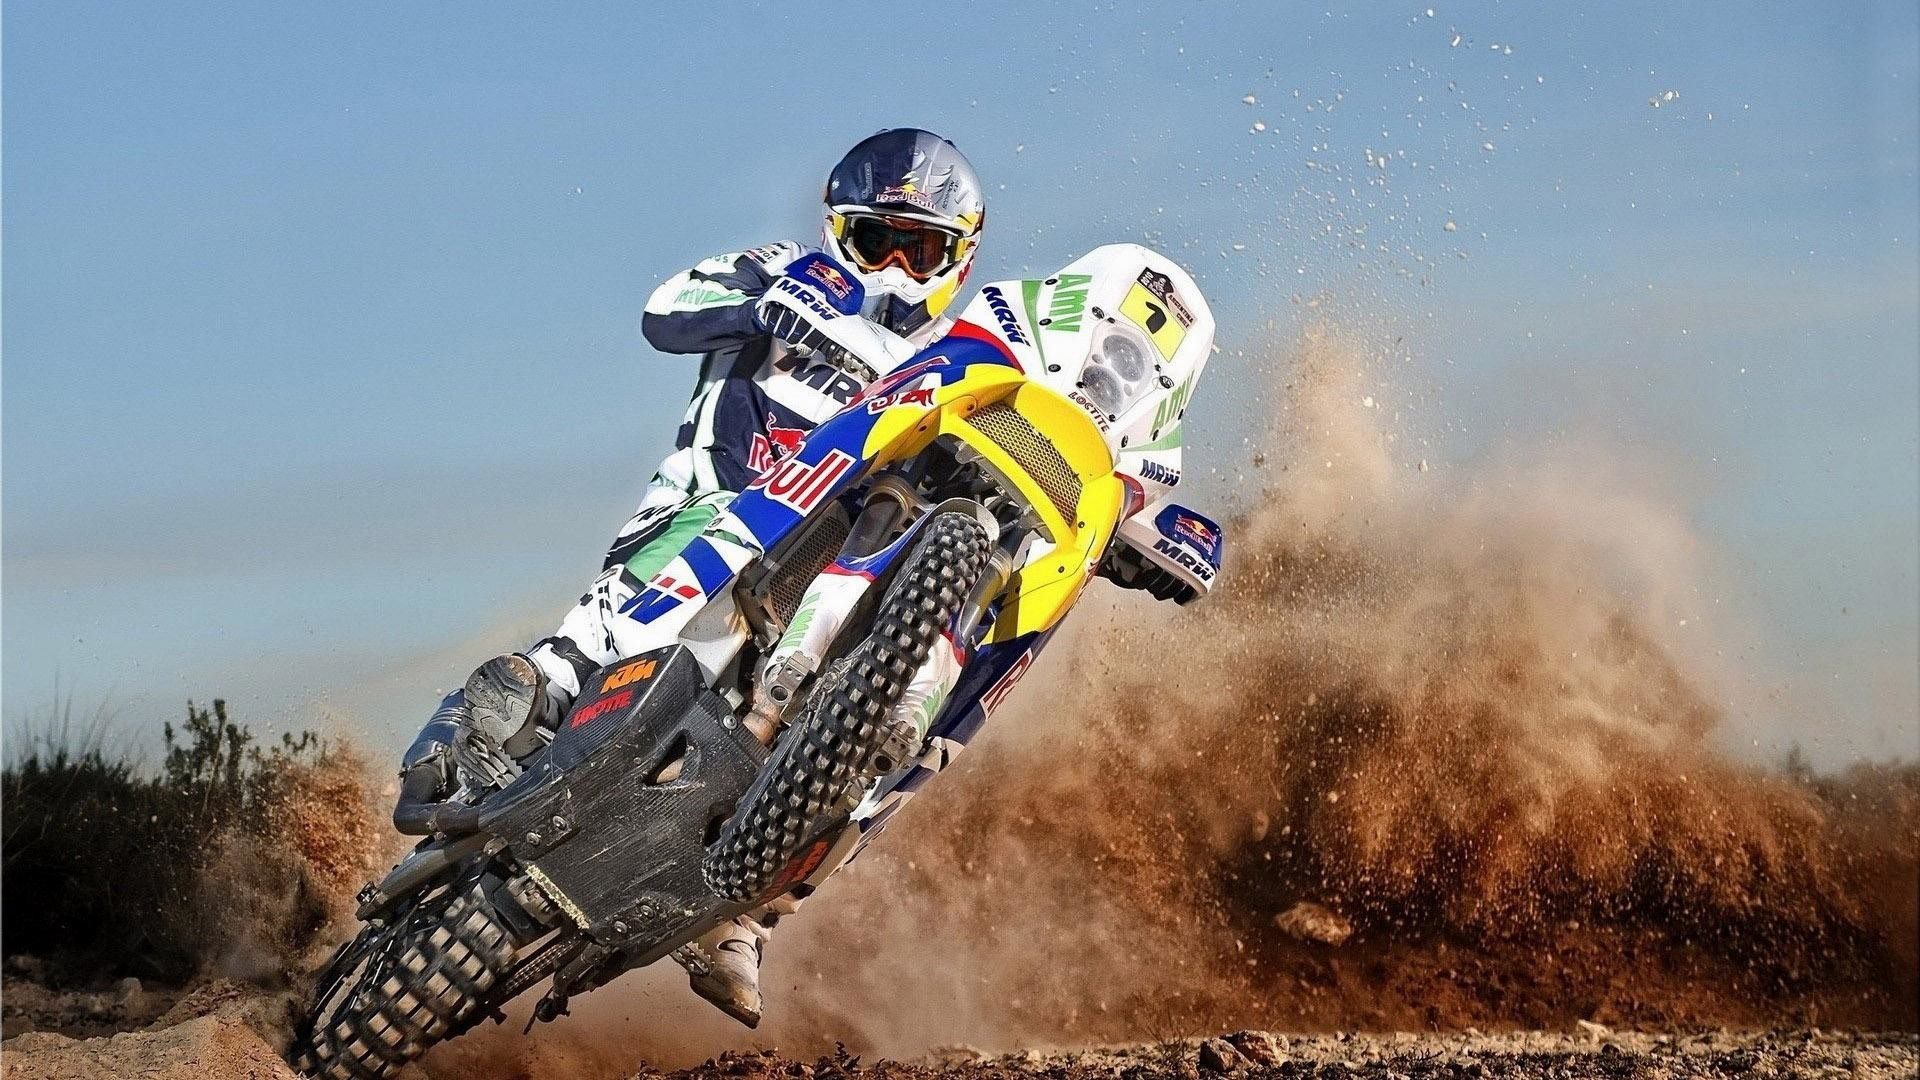 wallpaper.wiki-Desktop-Dirt-Bike-HD-Backgrounds-PIC-